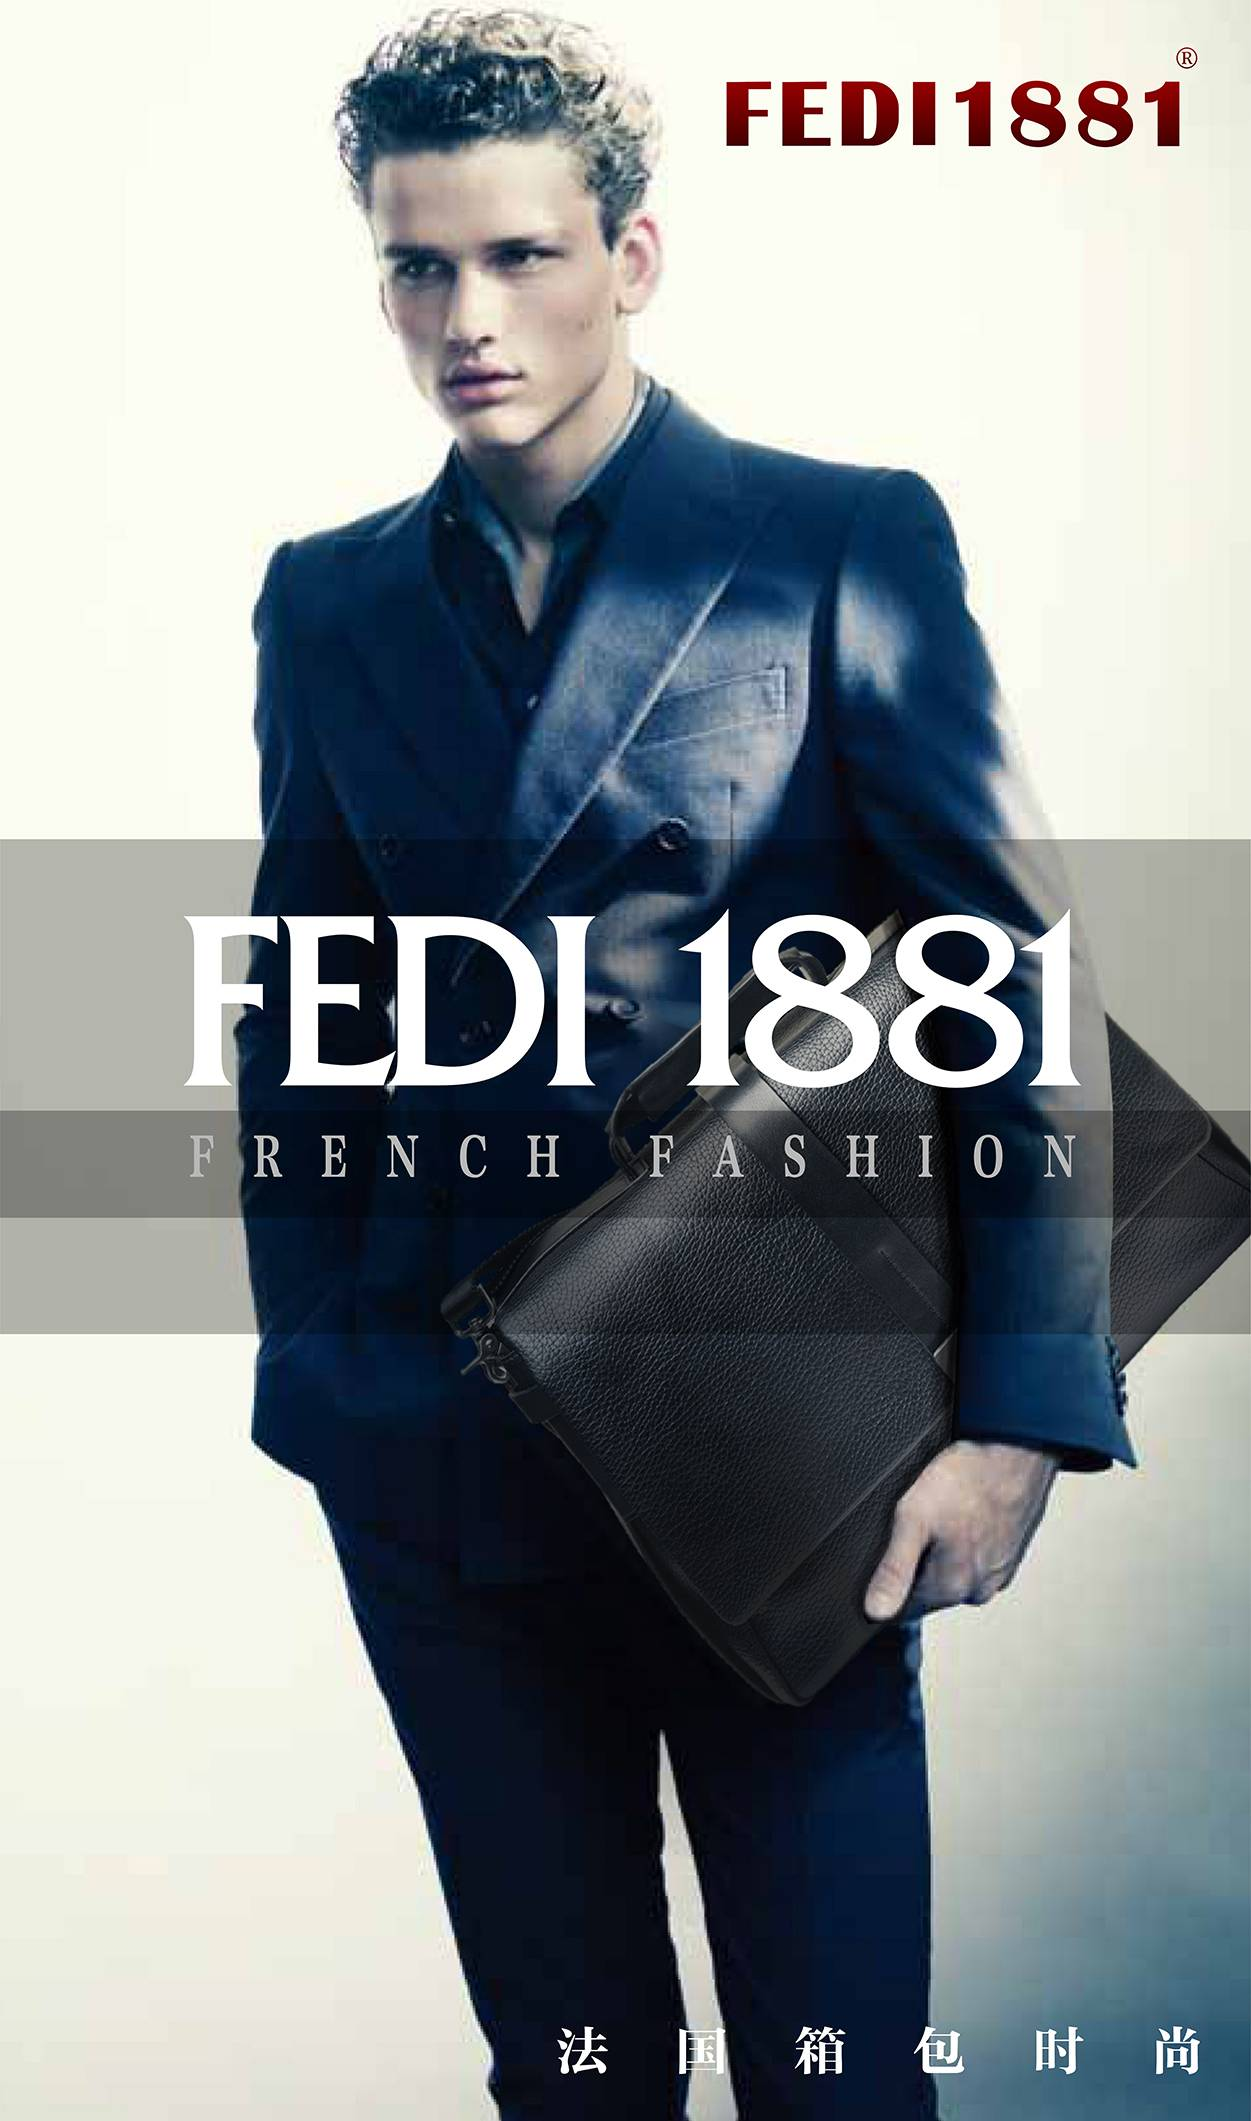 FEDI1881